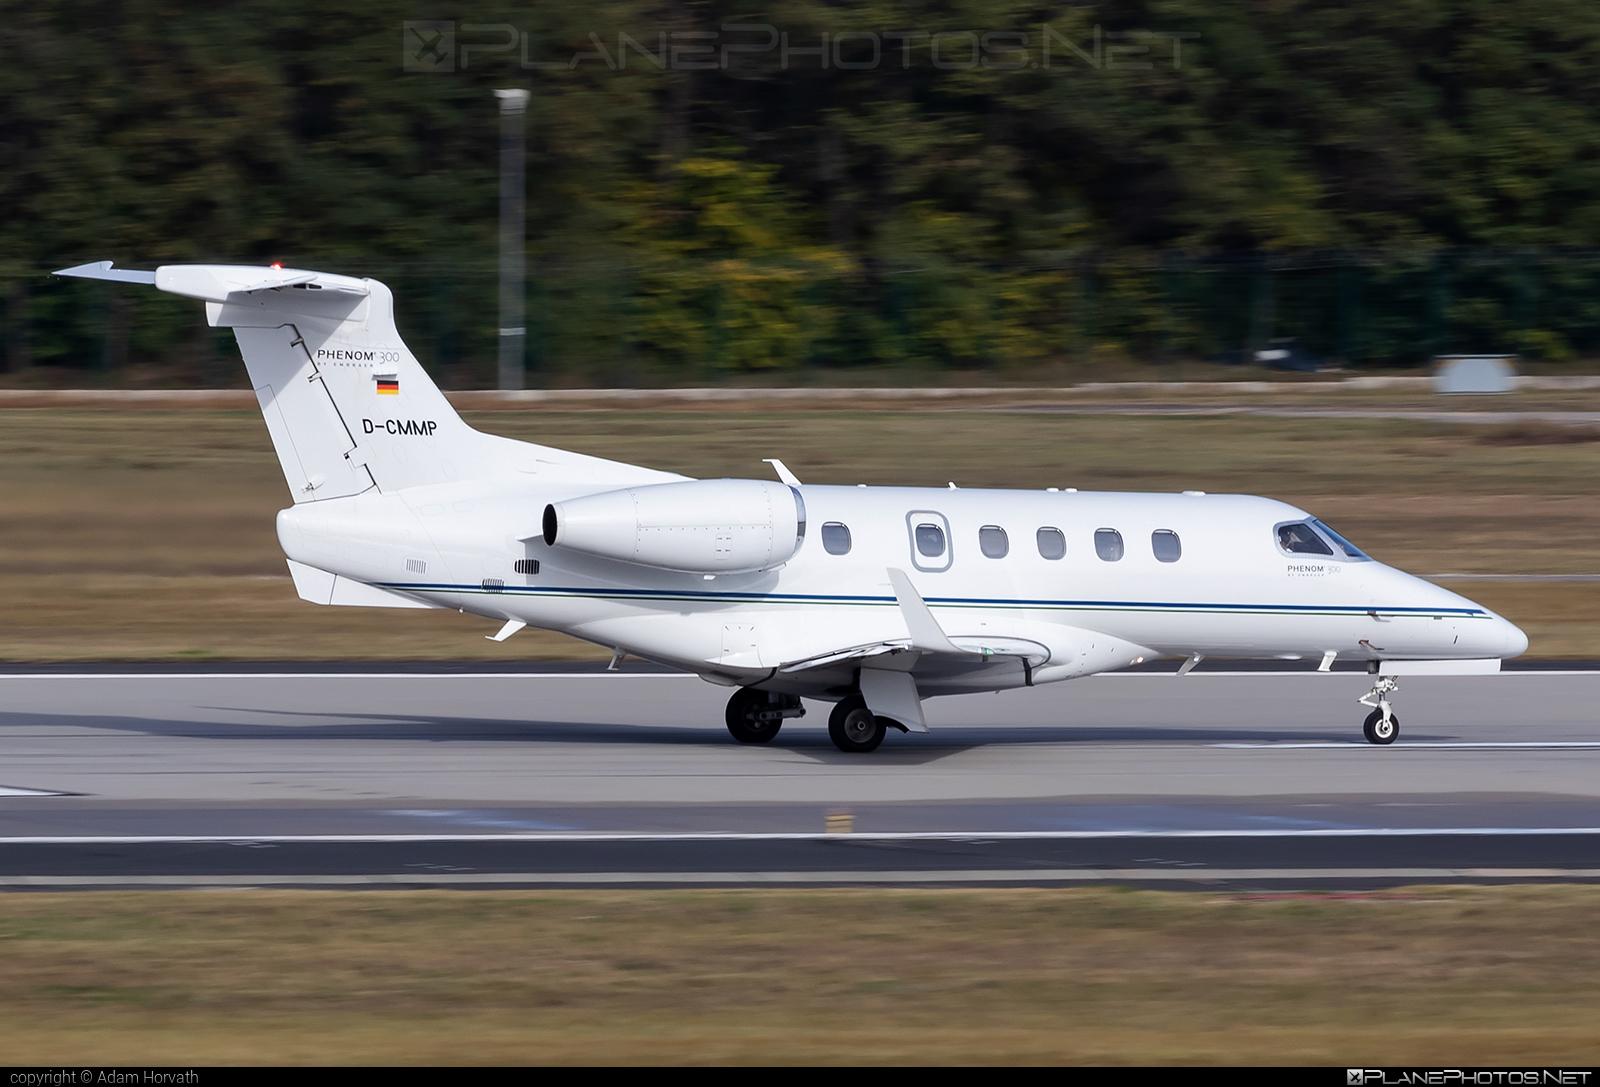 Embraer Phenom 300 (EMB-505) - D-CMMP operated by PADAVIATION #emb505 #embraer #embraer505 #embraerphenom #embraerphenom300 #padaviation #phenom300